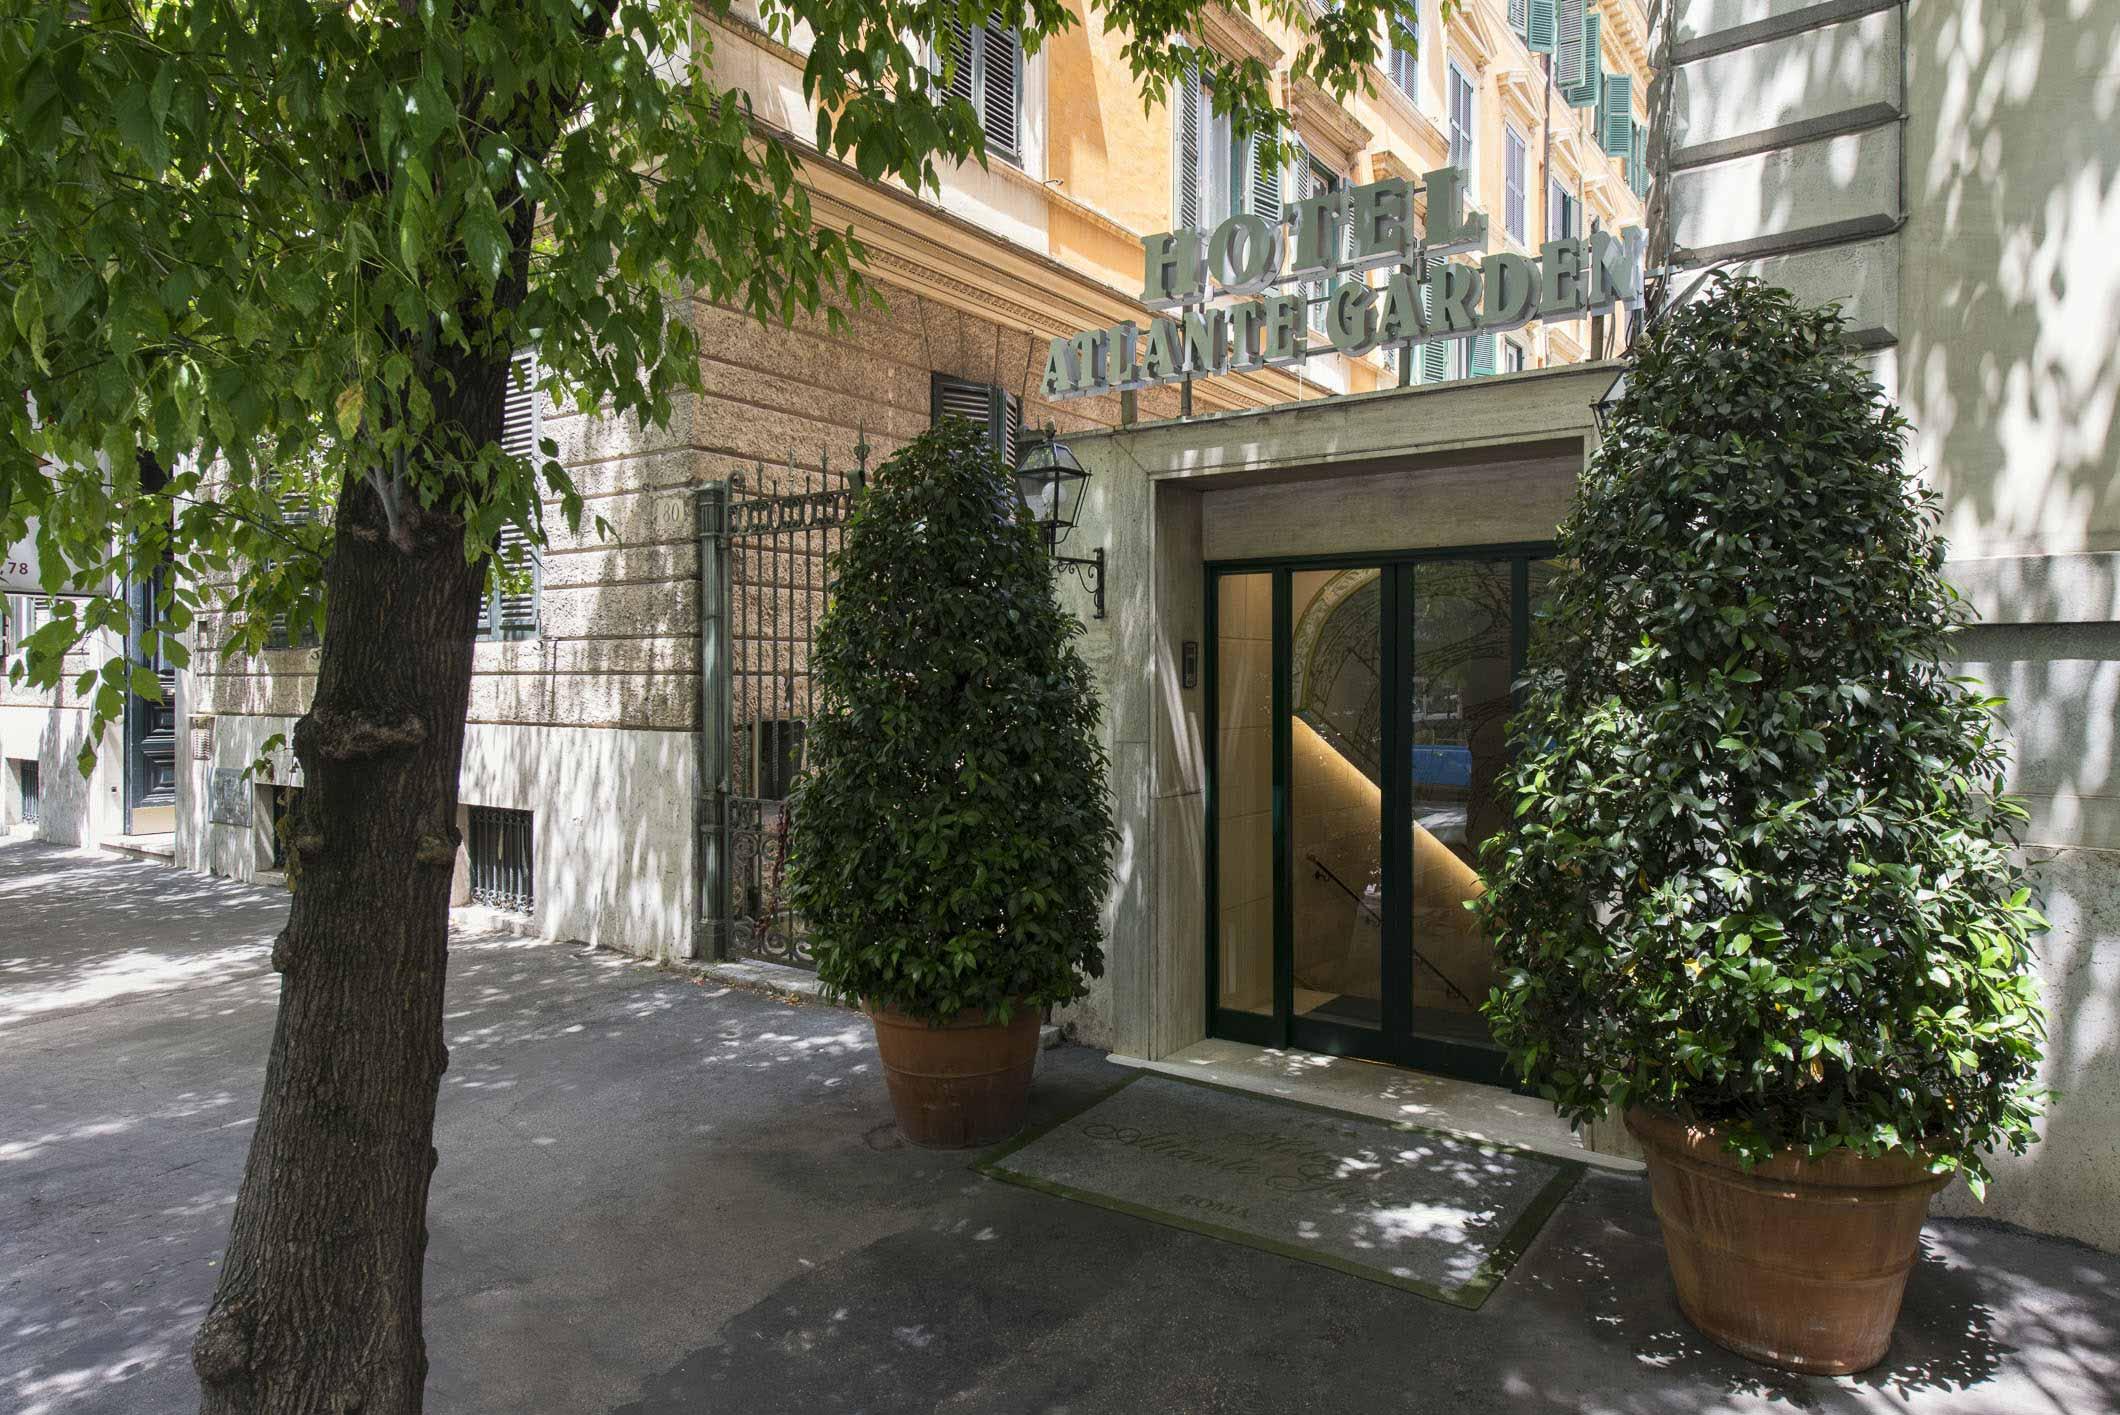 Fotografo per hotel a Roma – Atlante Garden #14